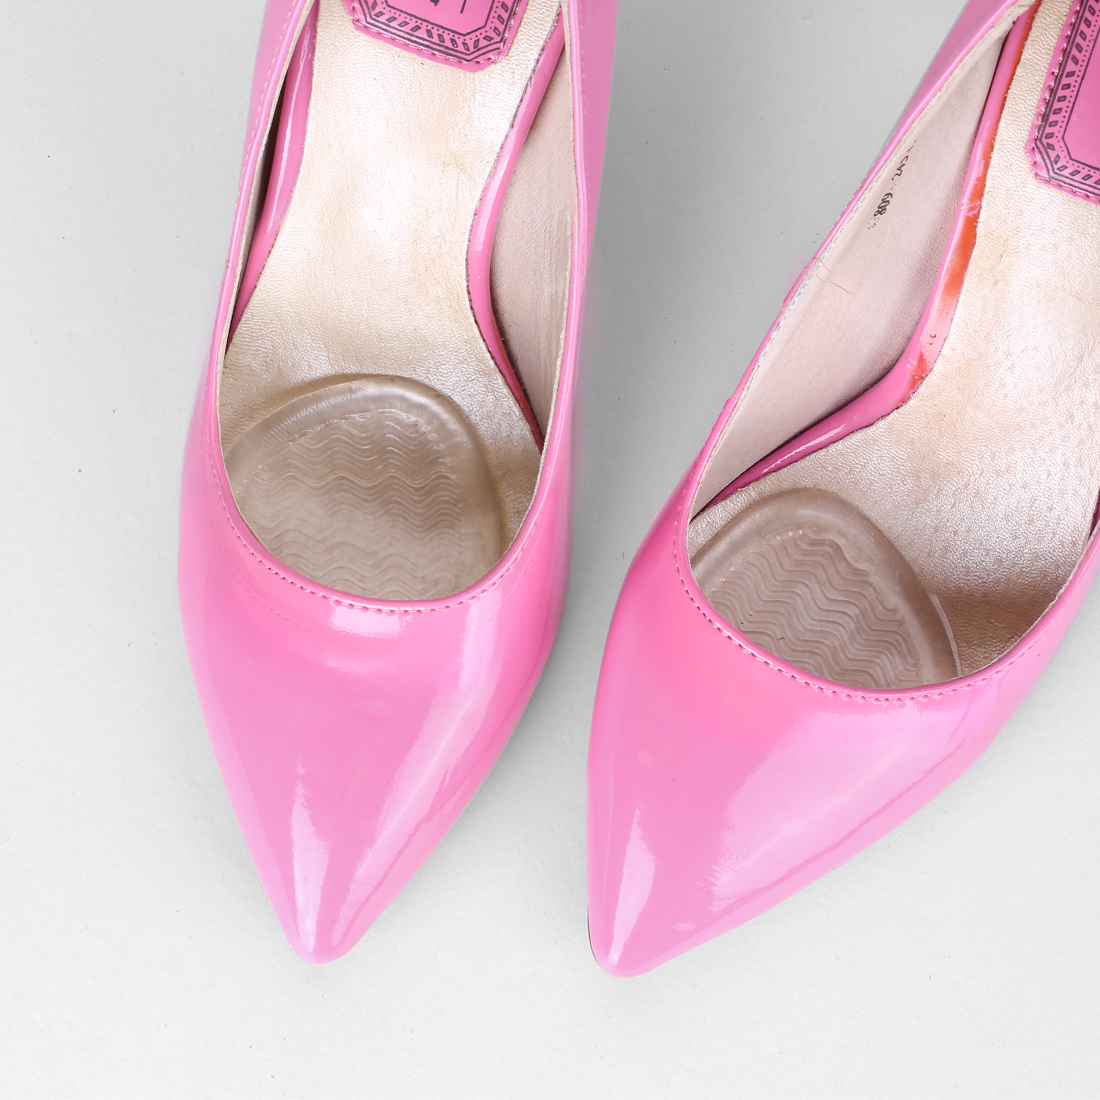 Gel Metatarsal Pad for Women Men High Heel Insert Rippled Pattern, 2 Pairs - image 1 of 5